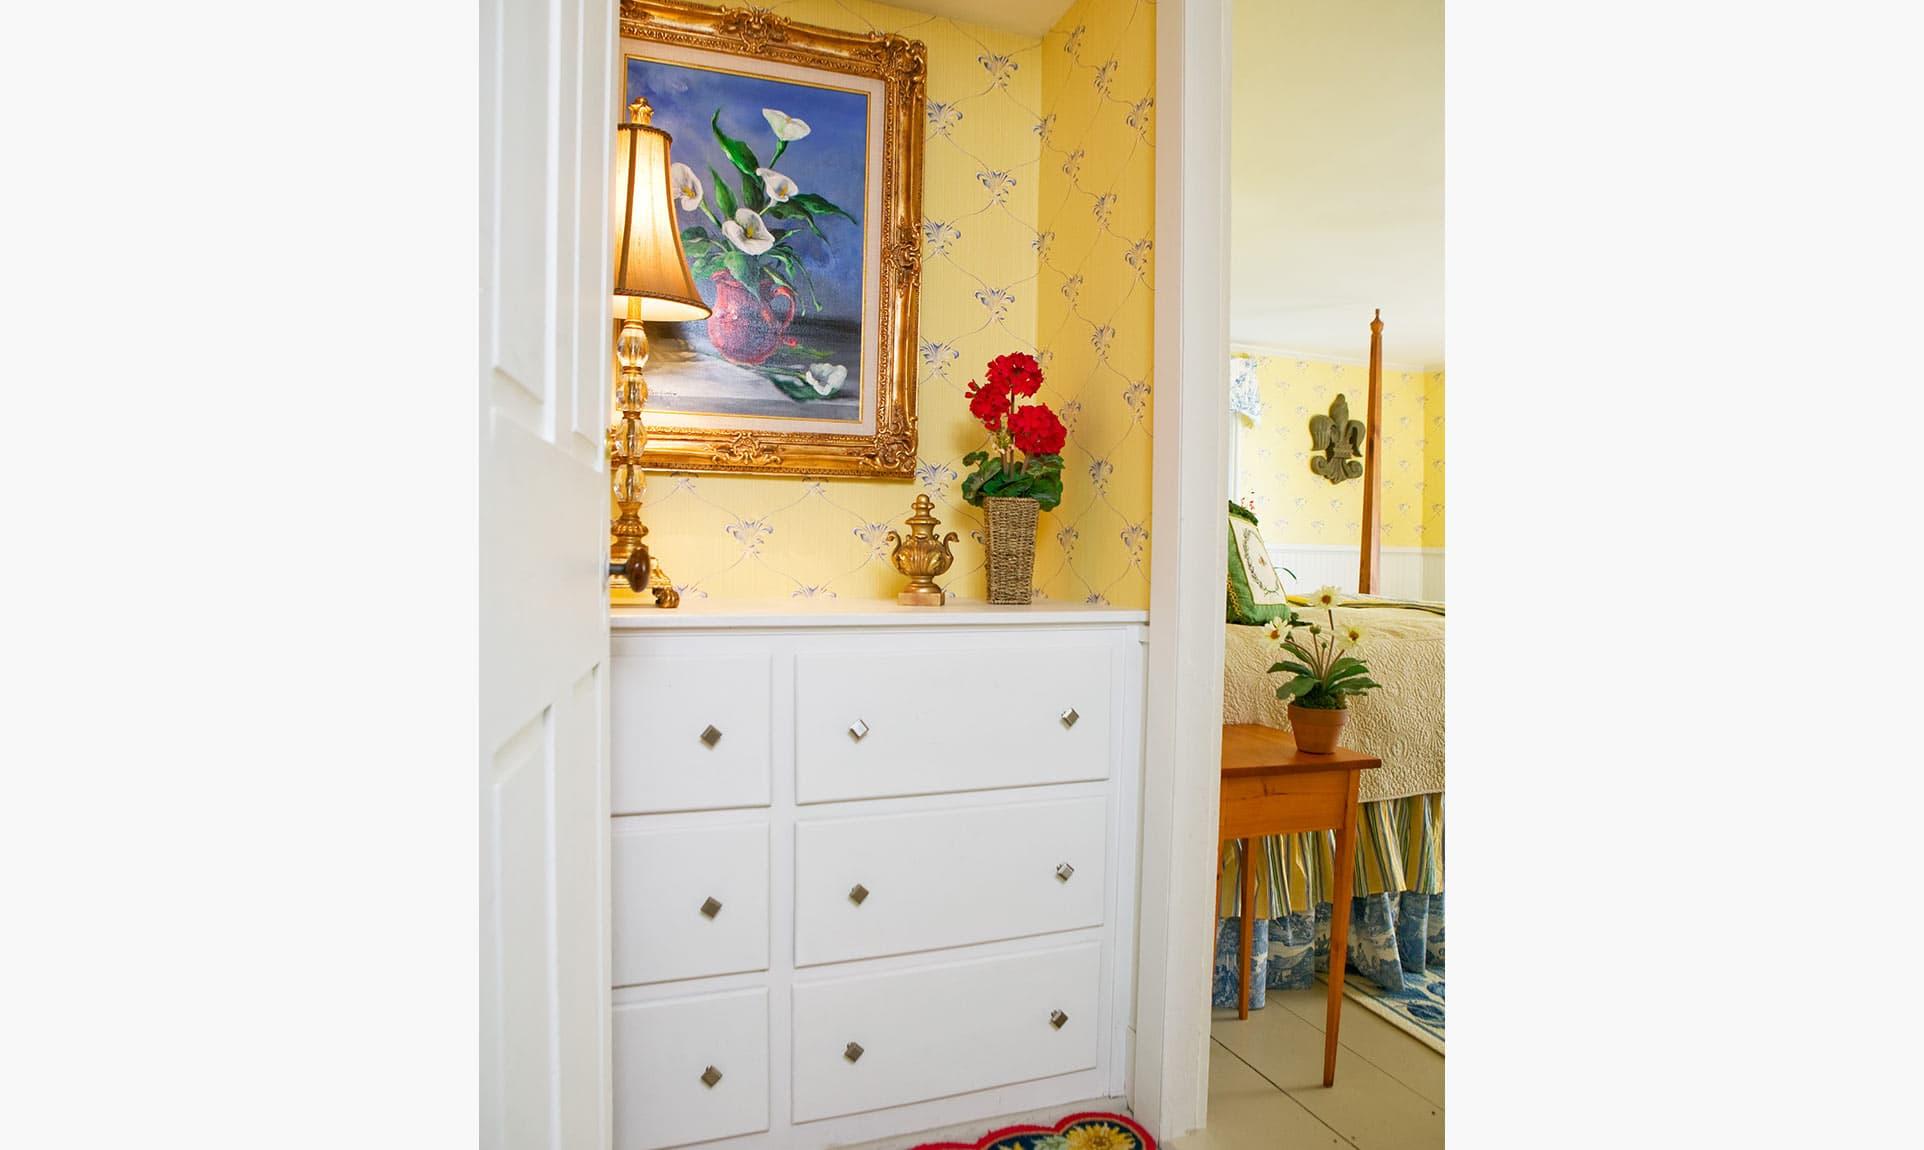 Entry into the Lemon Verbena Room at our Coastal Maine B&B